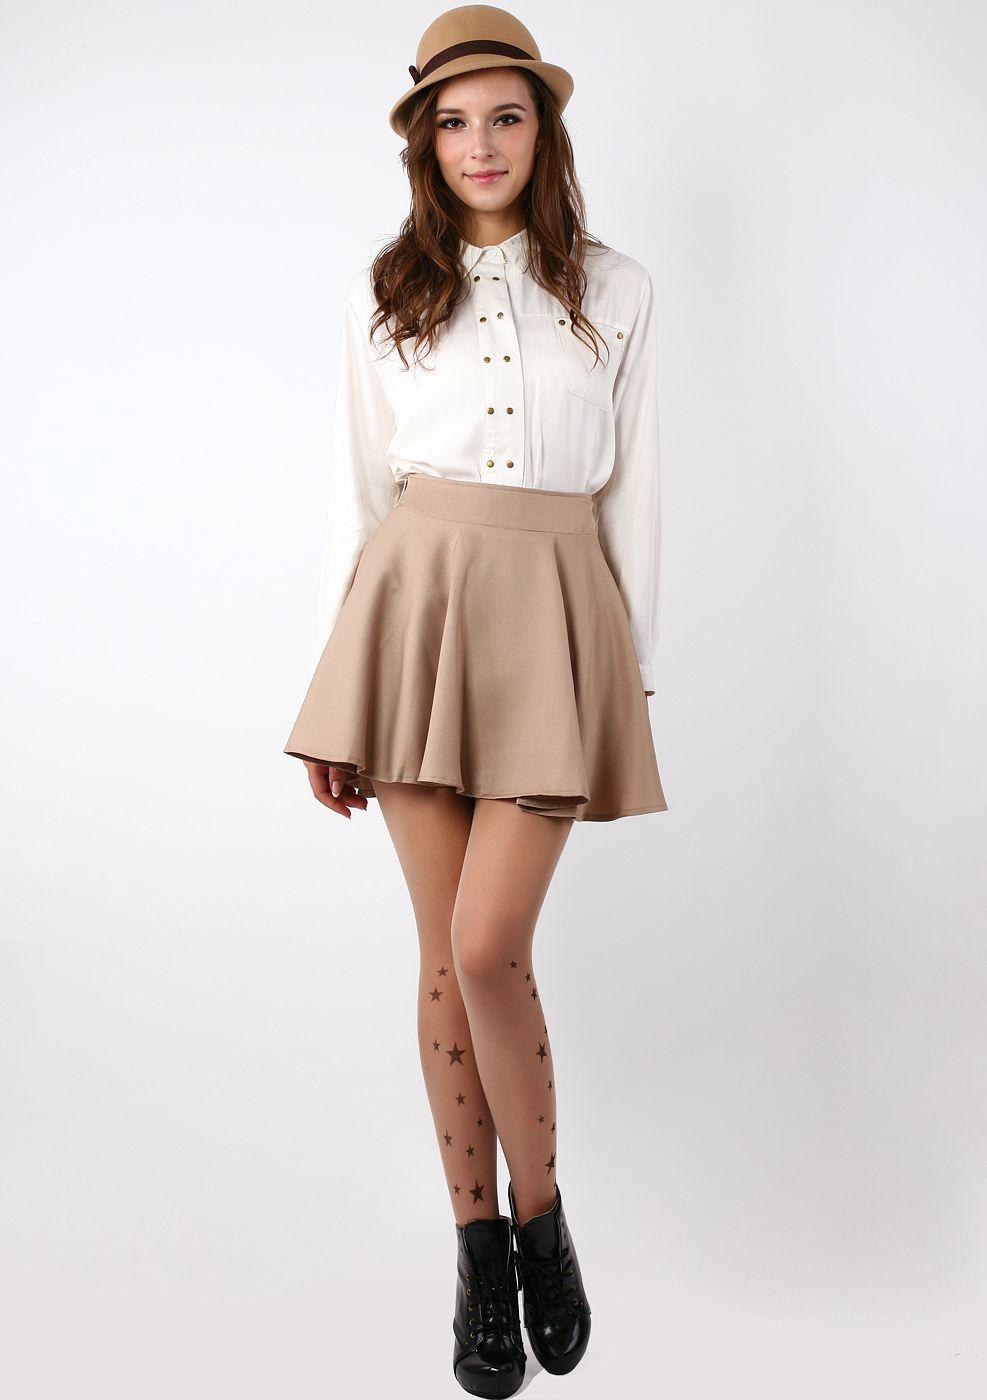 Khaki Skater Skirt - Bottoms - Retro Indie and Unique Fashion   Fall Fashion CO-OPhx ...